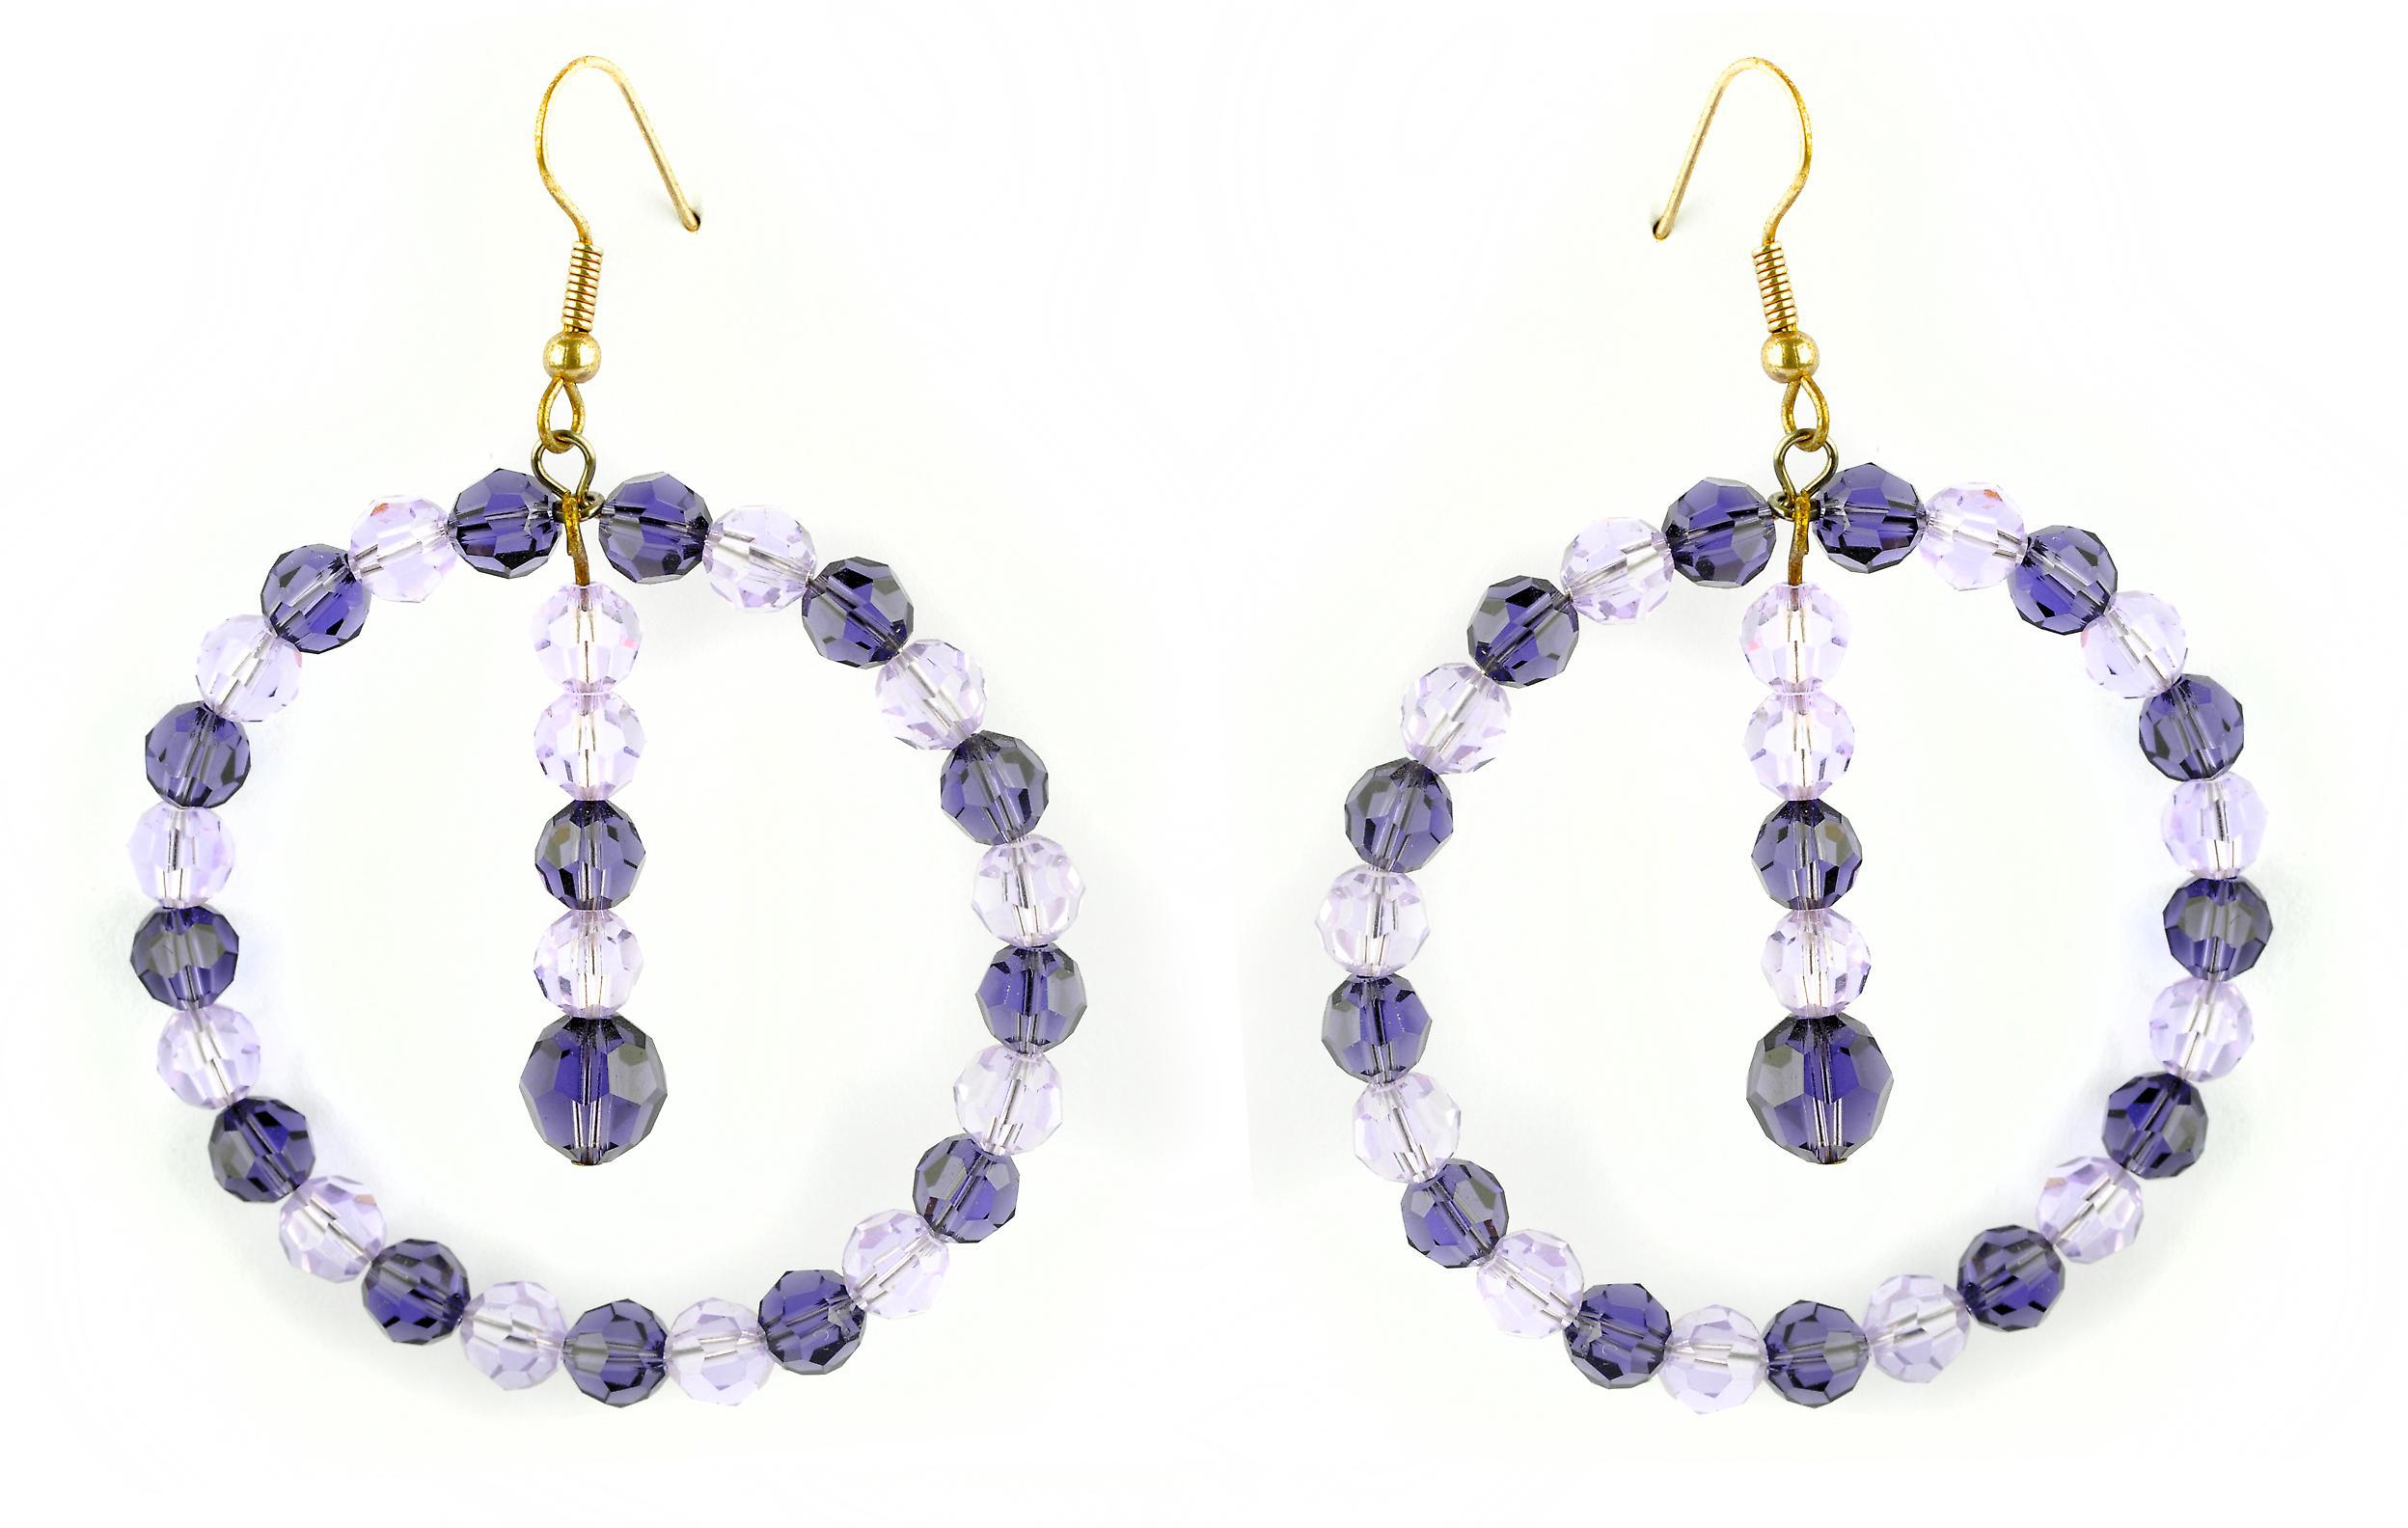 Waooh - sieraden - WJ0718 - oorbellen met strass Swarovski paars Lila - mount kleur goud